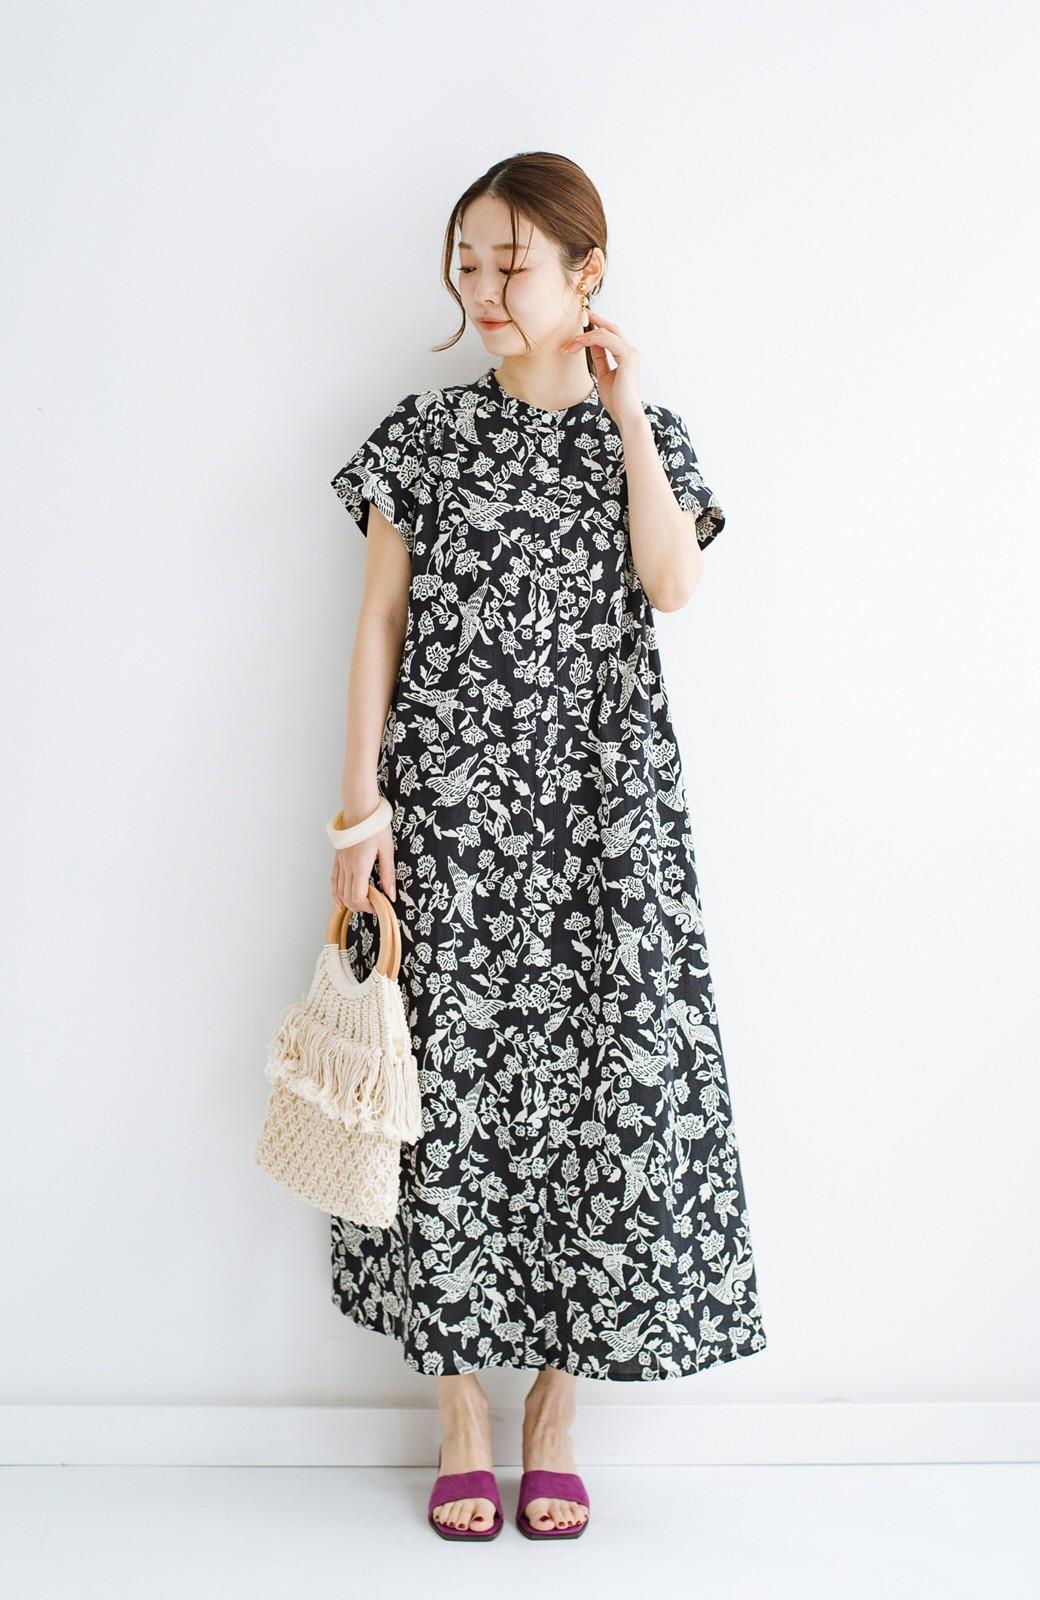 haco! 京都の浴衣屋さんと作った浴衣生地の羽織ってもかわいいロングワンピース <ブラック系その他>の商品写真13